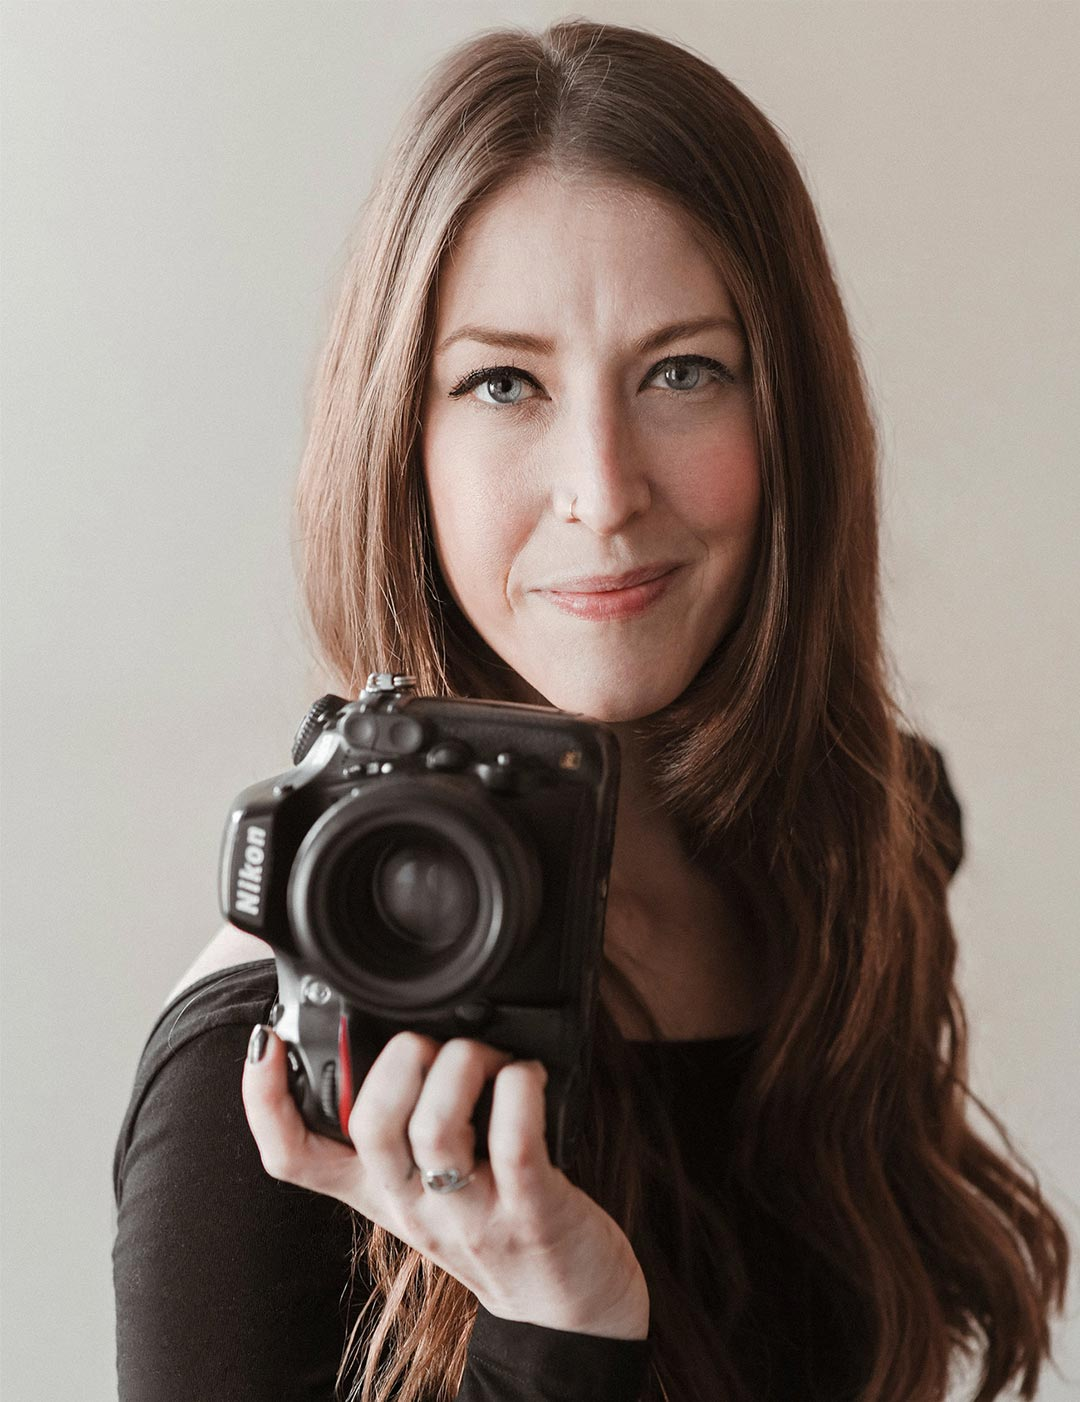 christina-photographer-atlantic-city-new-jersey-taylor-content.jpg